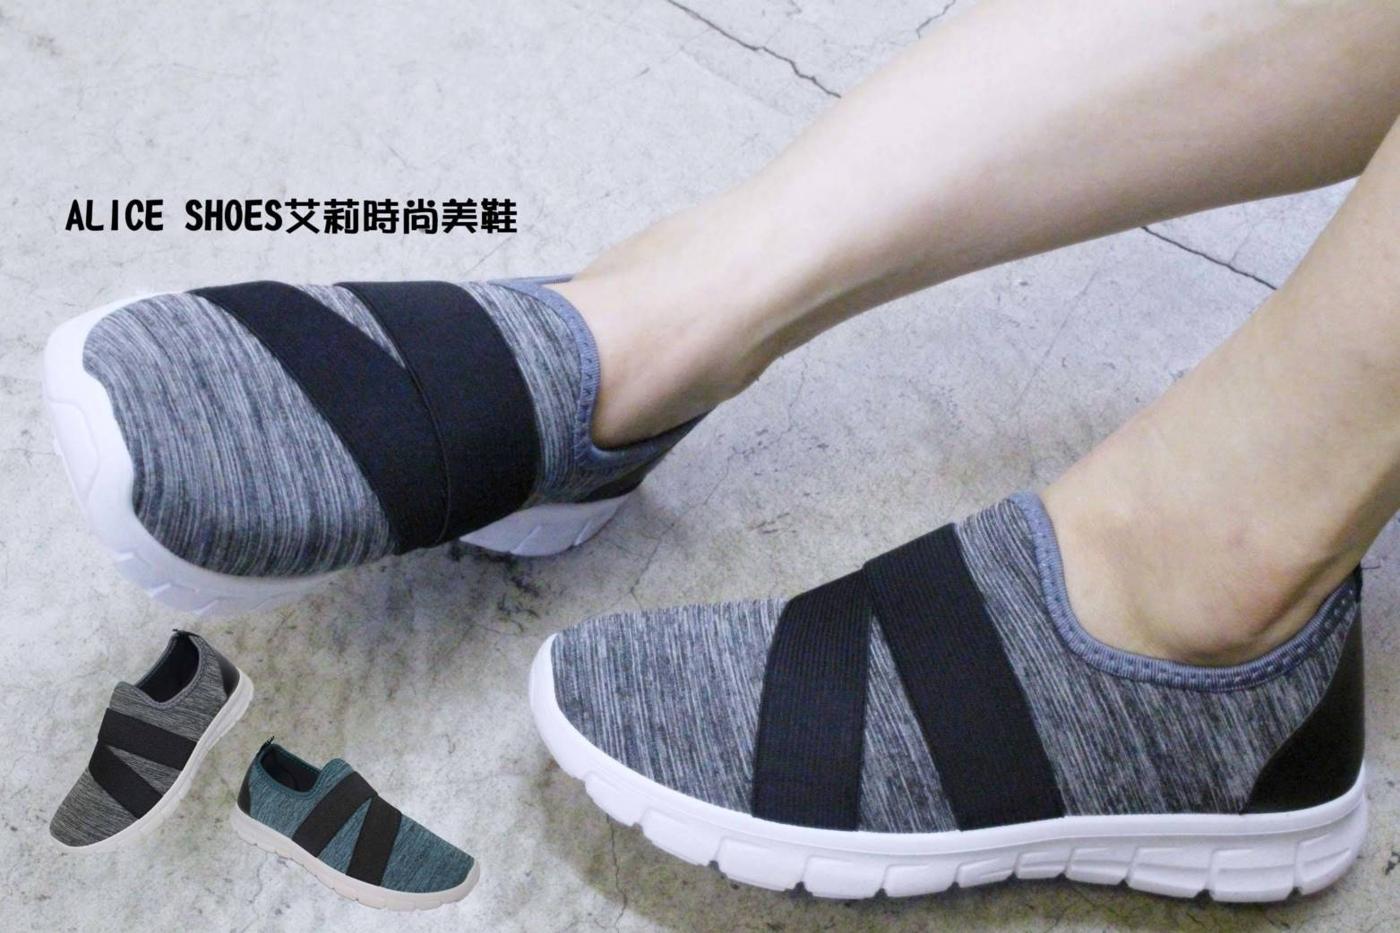 ALICE SHOES艾莉時尚美鞋 請把握!!搶鮮擁有韓系帆布鞋/休閒鞋/平底鞋@K726@@800免運@